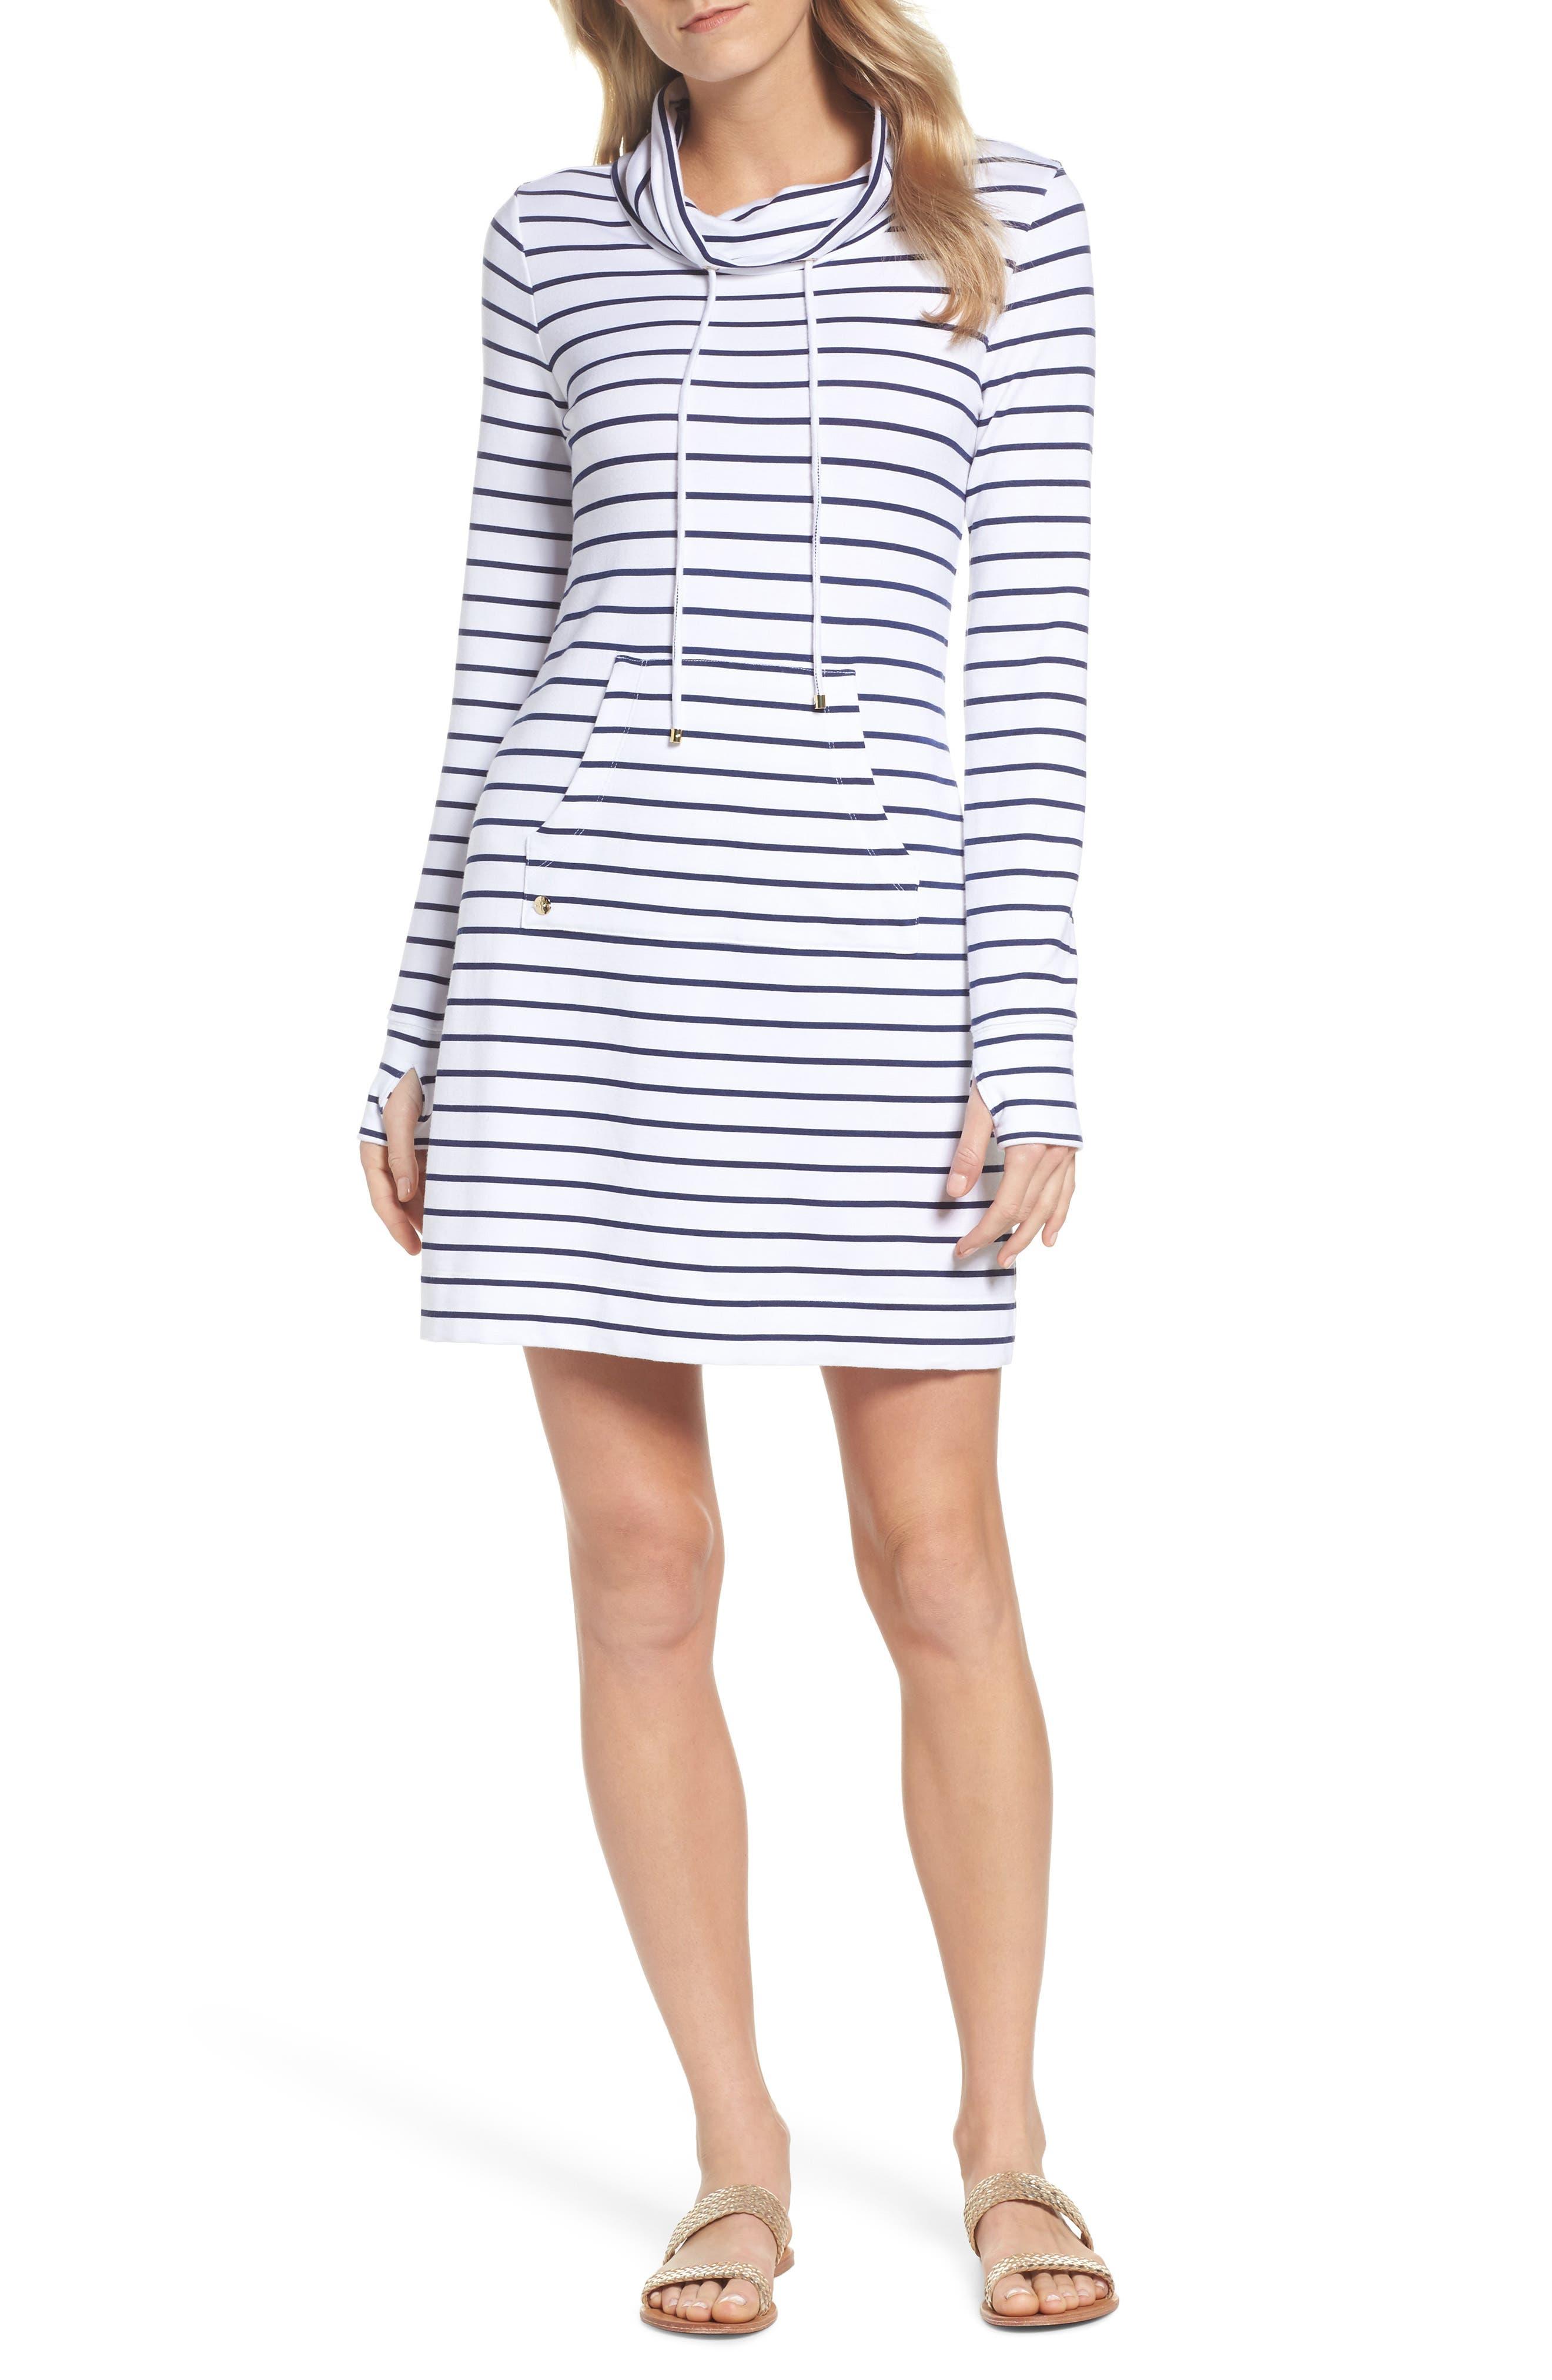 Hilary UPF 50+ Dress,                         Main,                         color,